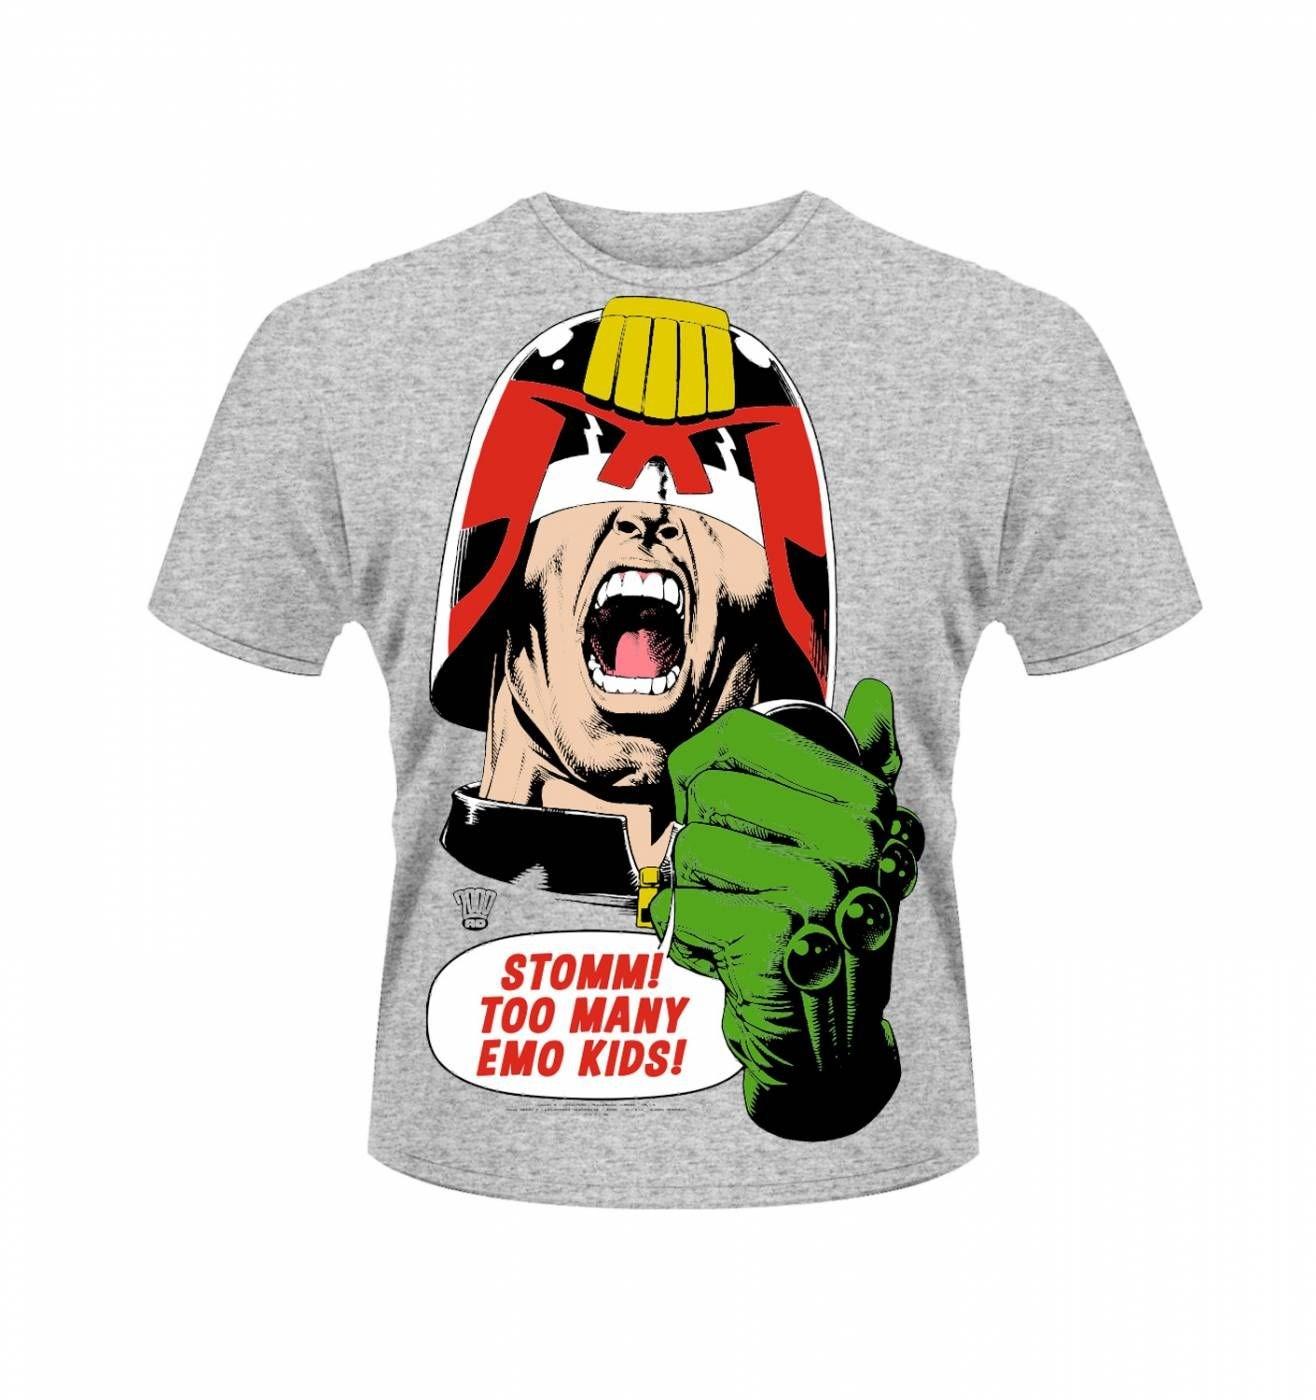 OFFICIAL 2000AD Judge Dredd Emo Kids t-shirt